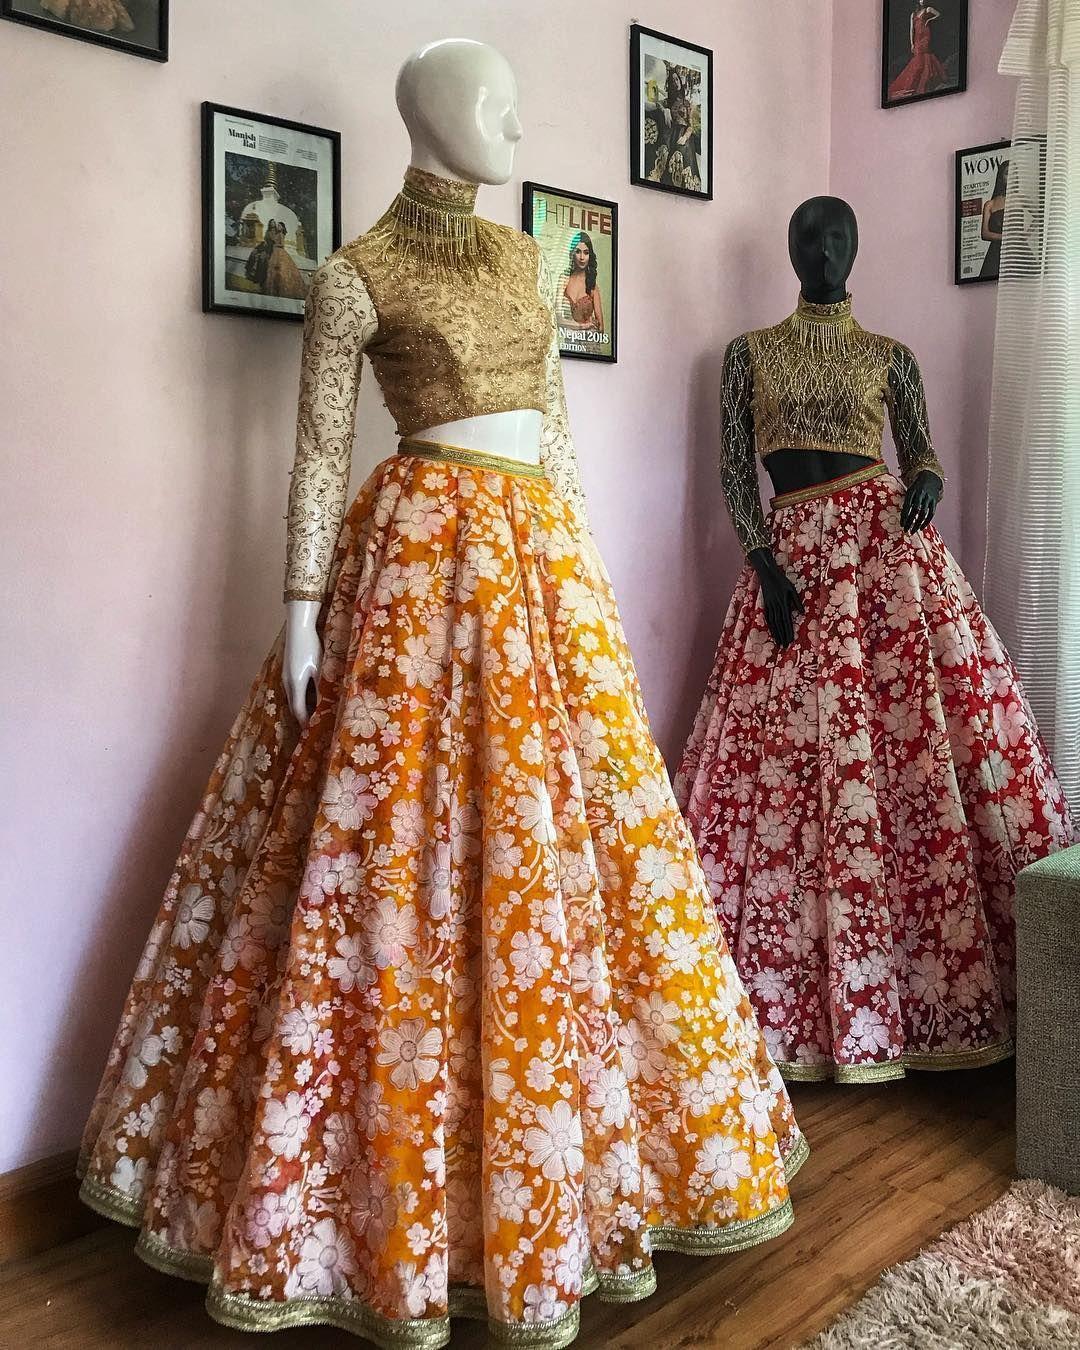 Trending Florals Manishrai Manishraioccassionwear Dm For Price Trending Fashion High Waisted Skirt